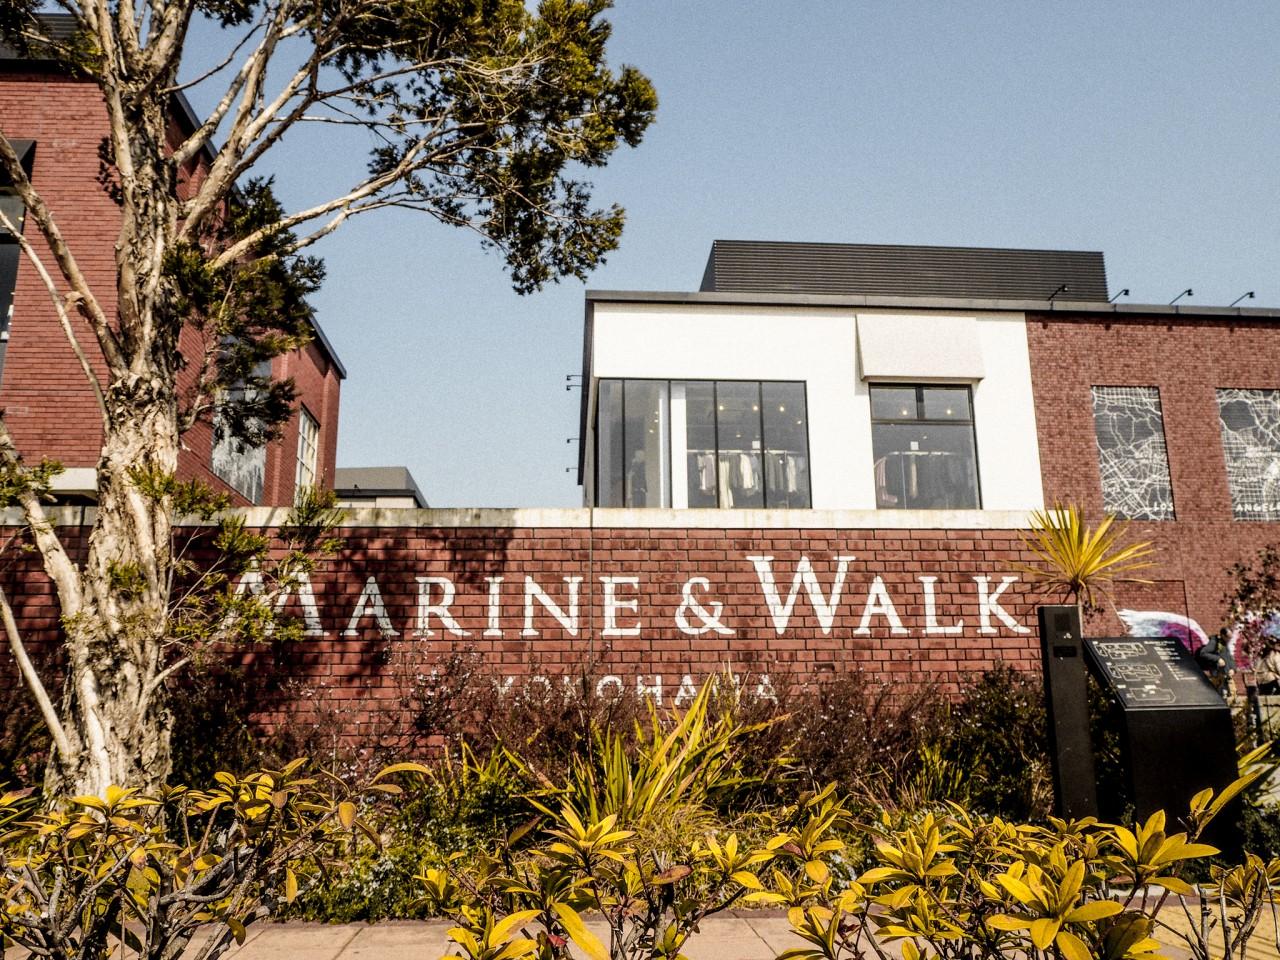 MARINE&WALK横浜看板